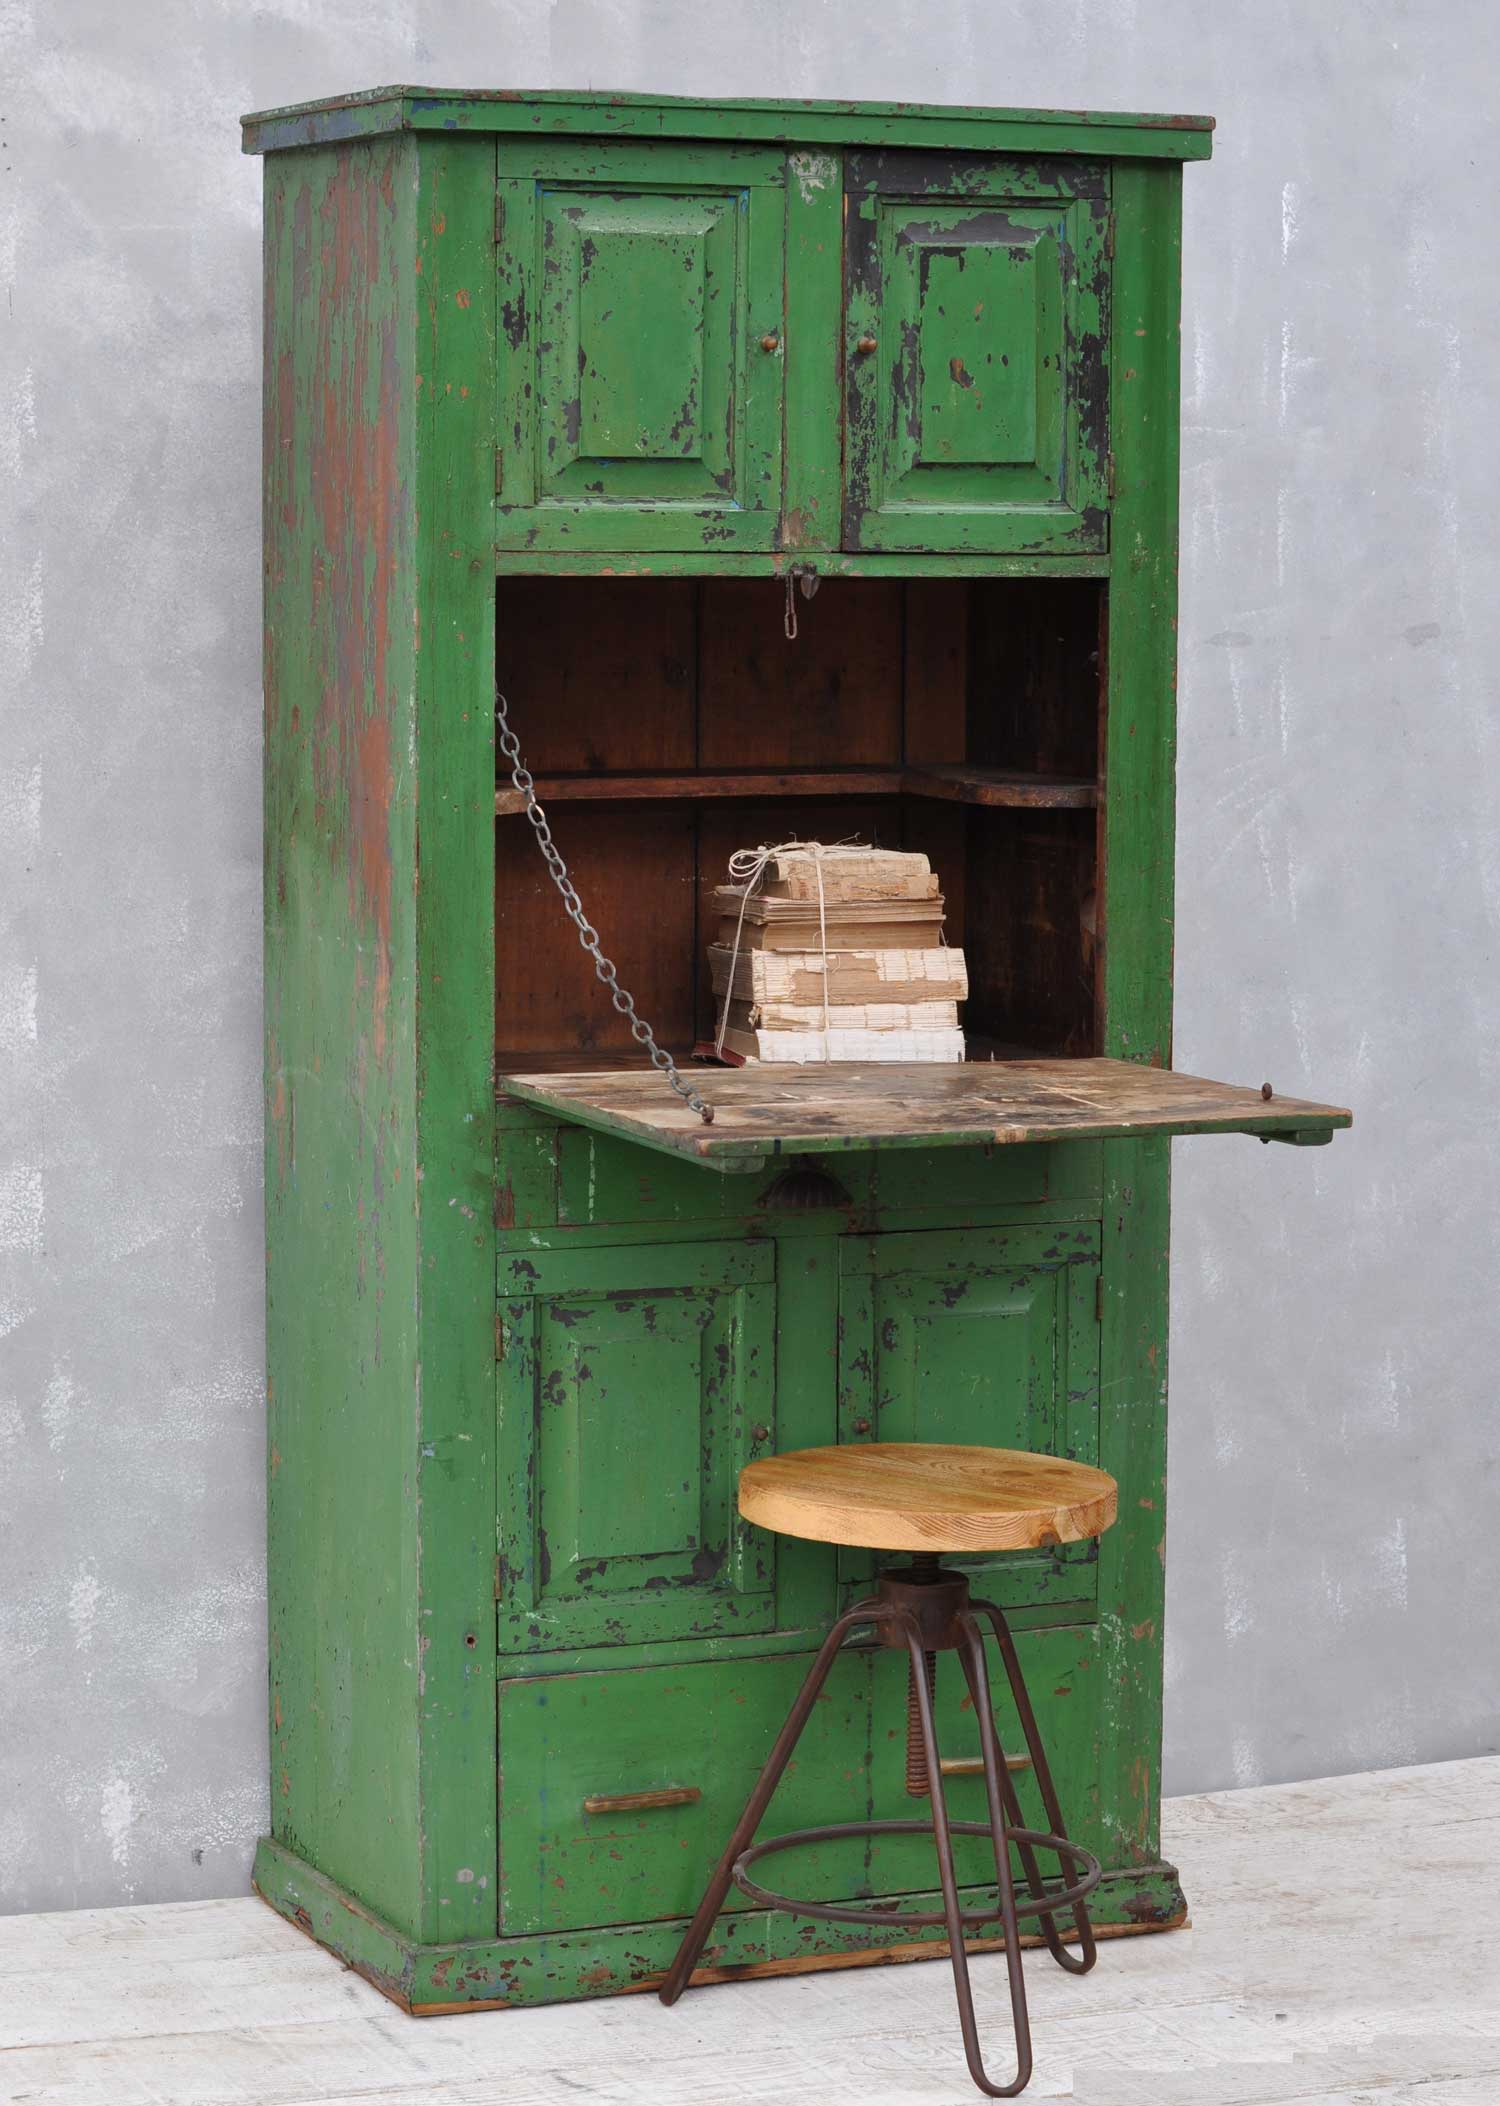 Rustic Vintage Bureau Tall Cabinet Original Green Paintwork  Home Barn Vintage